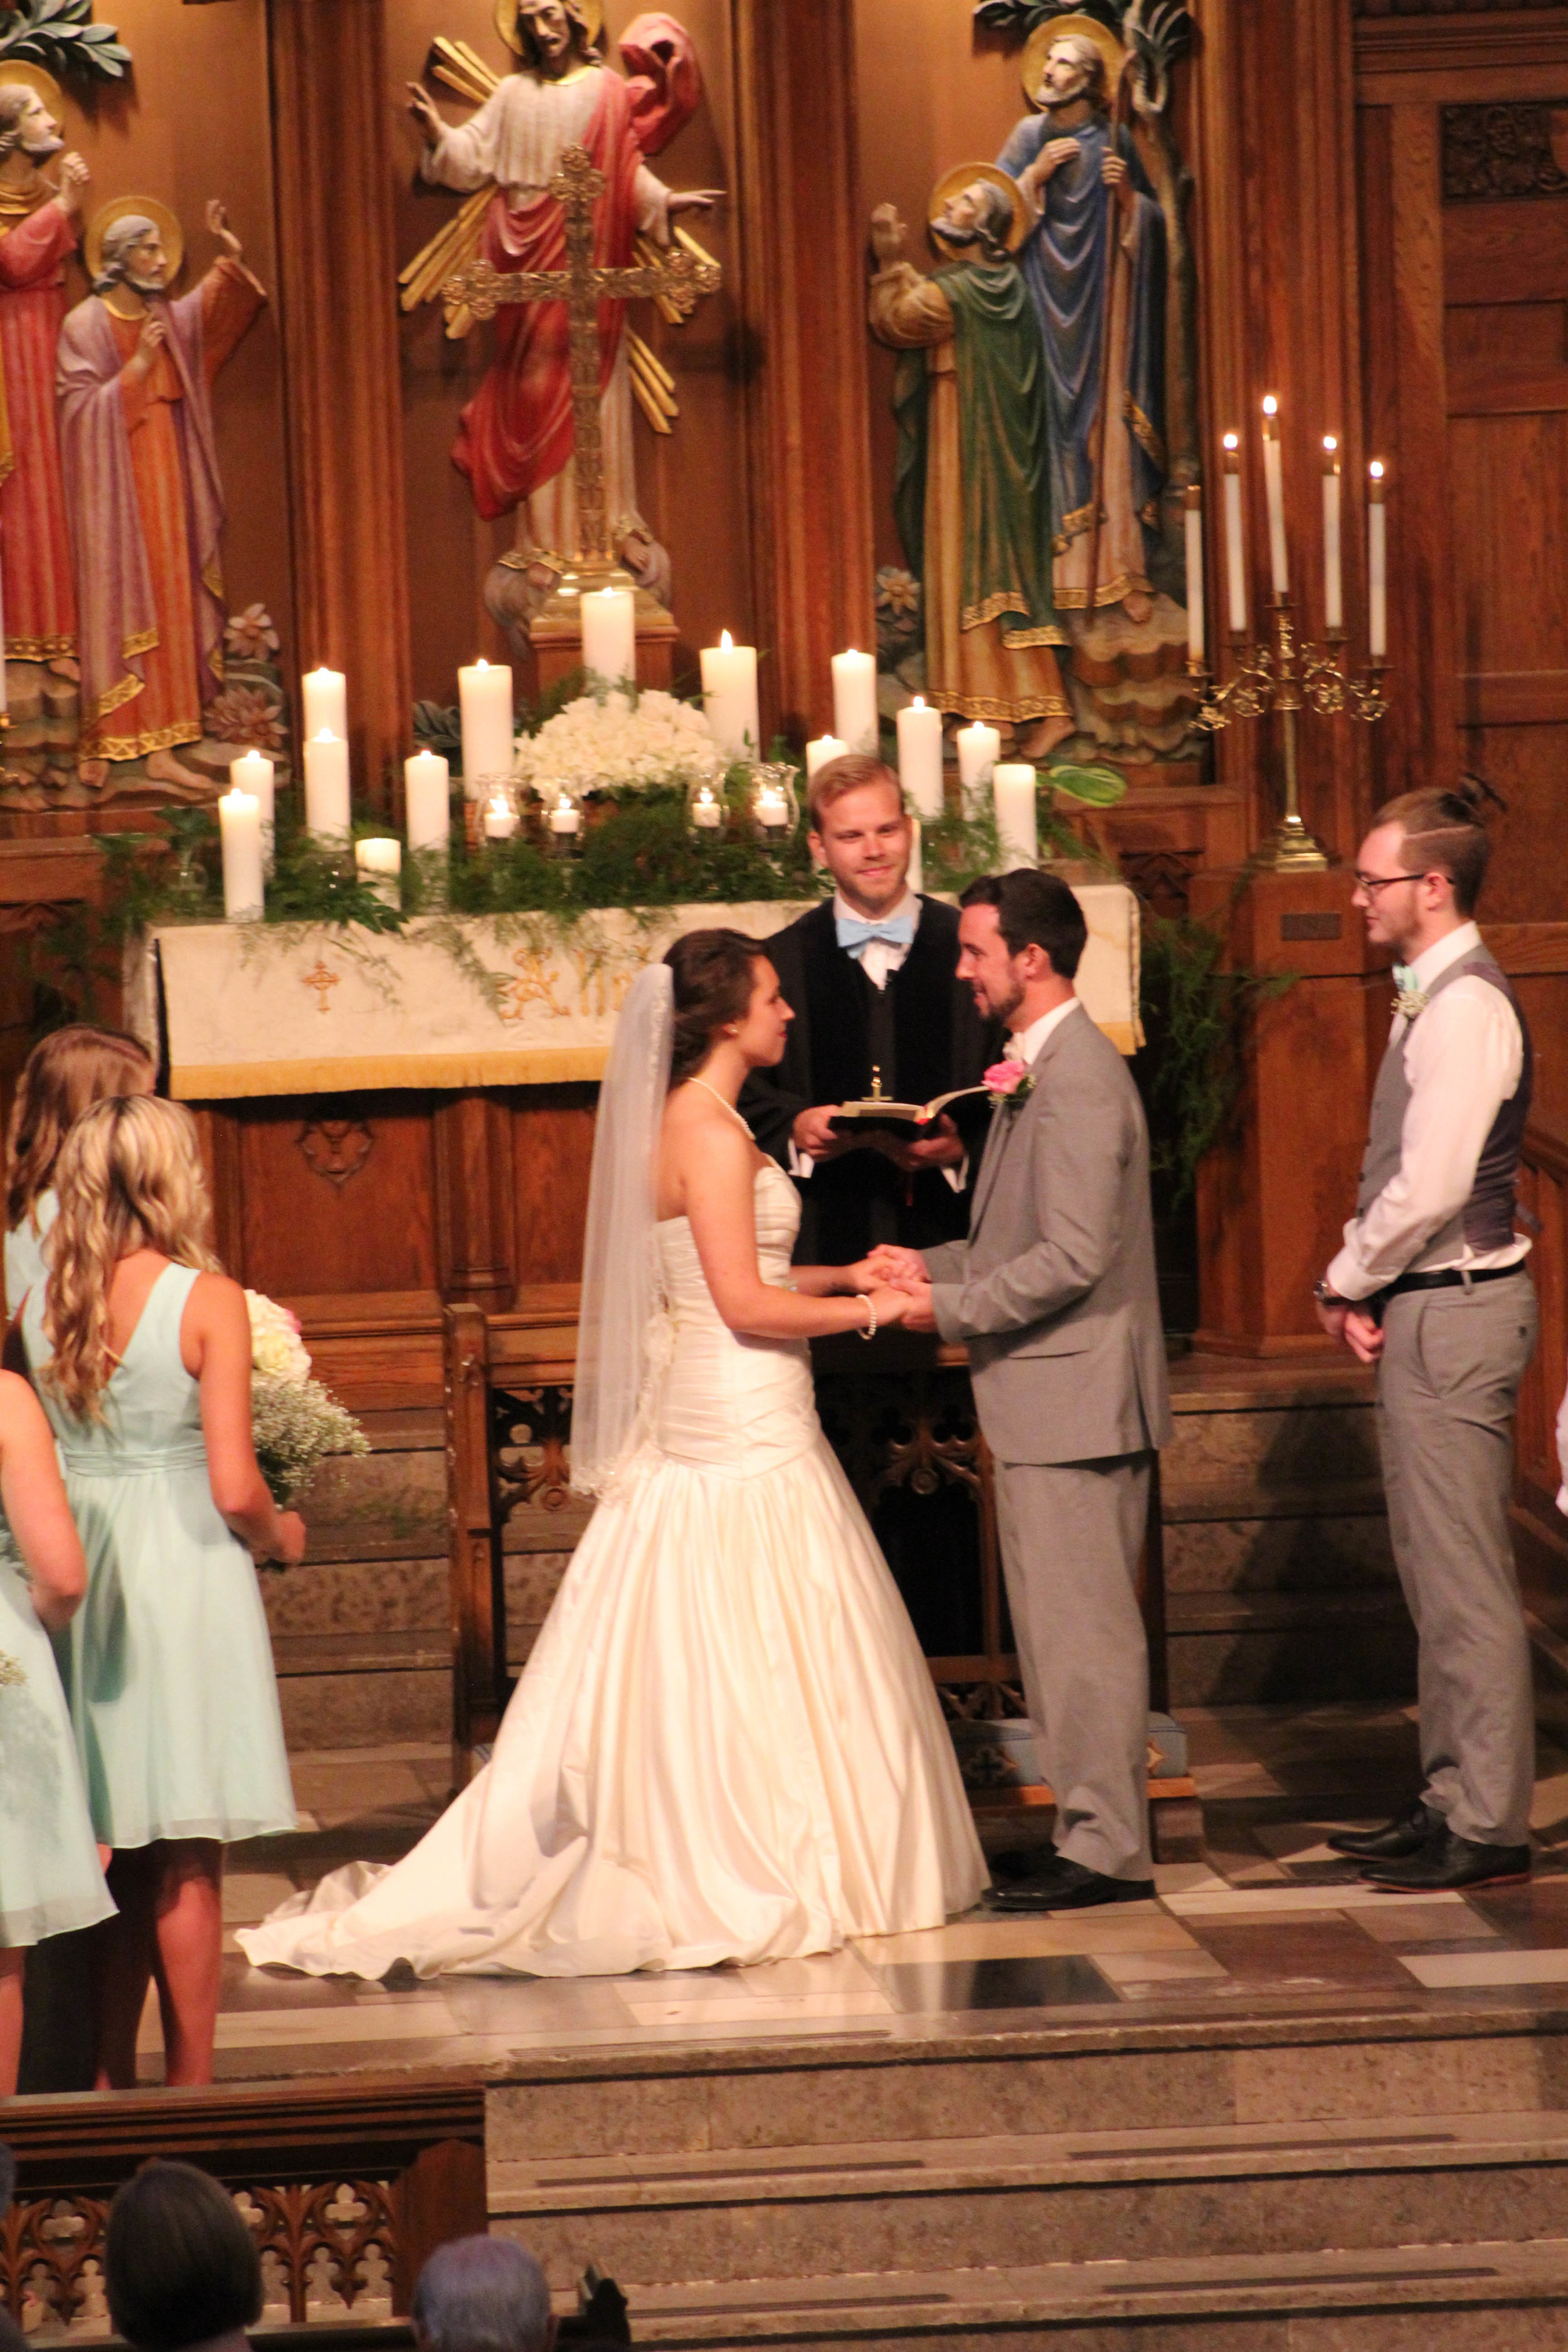 family-ceremony-176.jpg